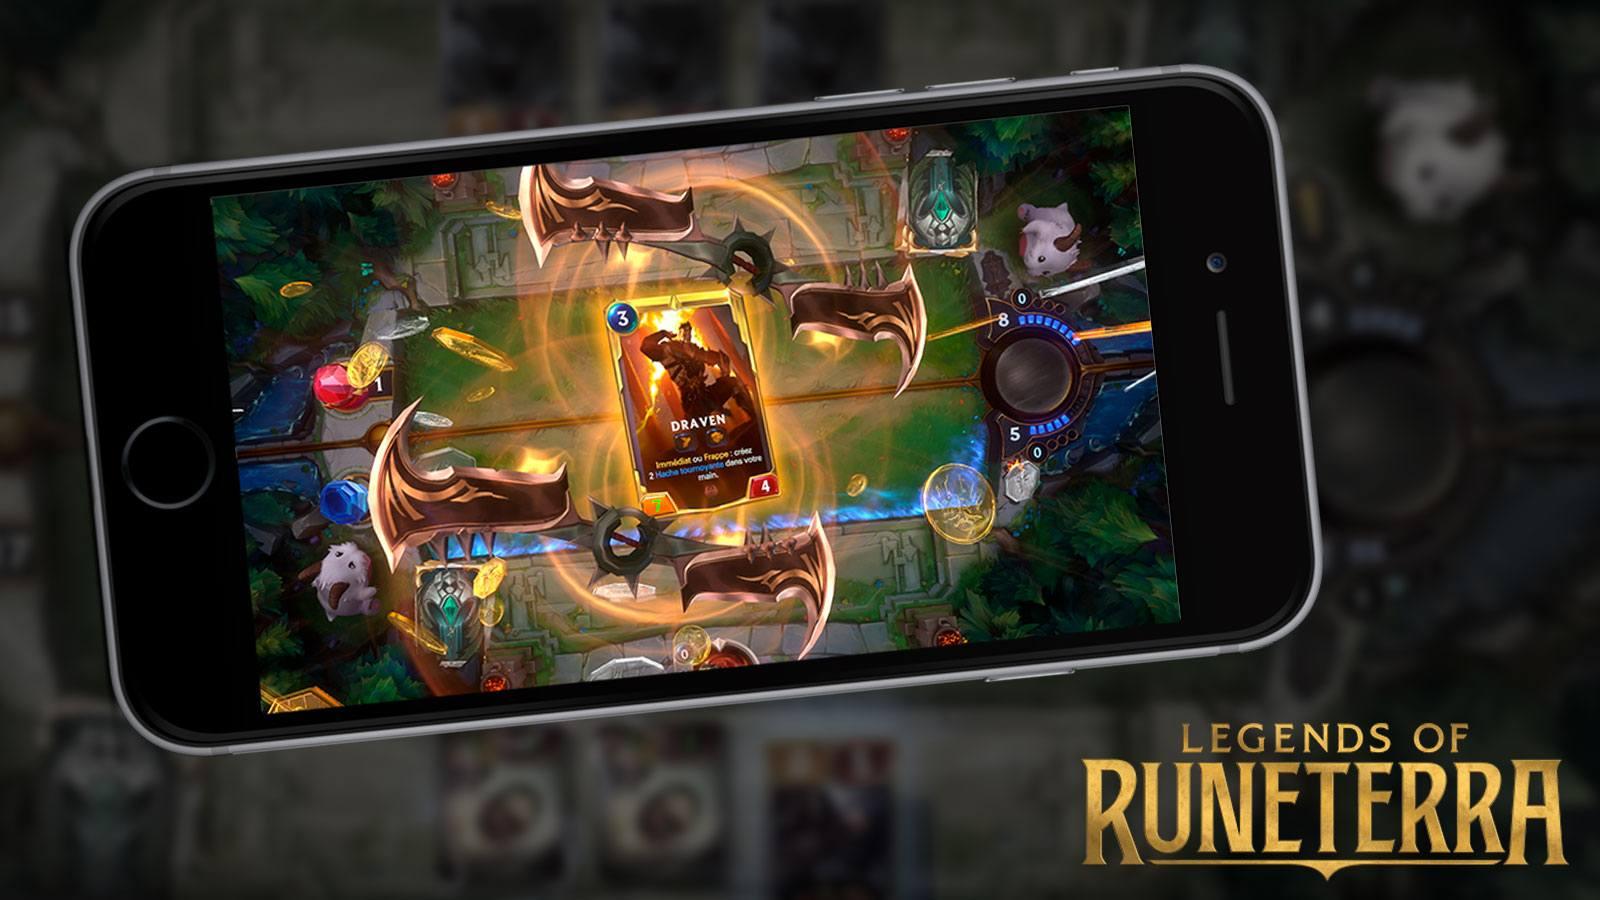 Legends of Runeterra sur mobile